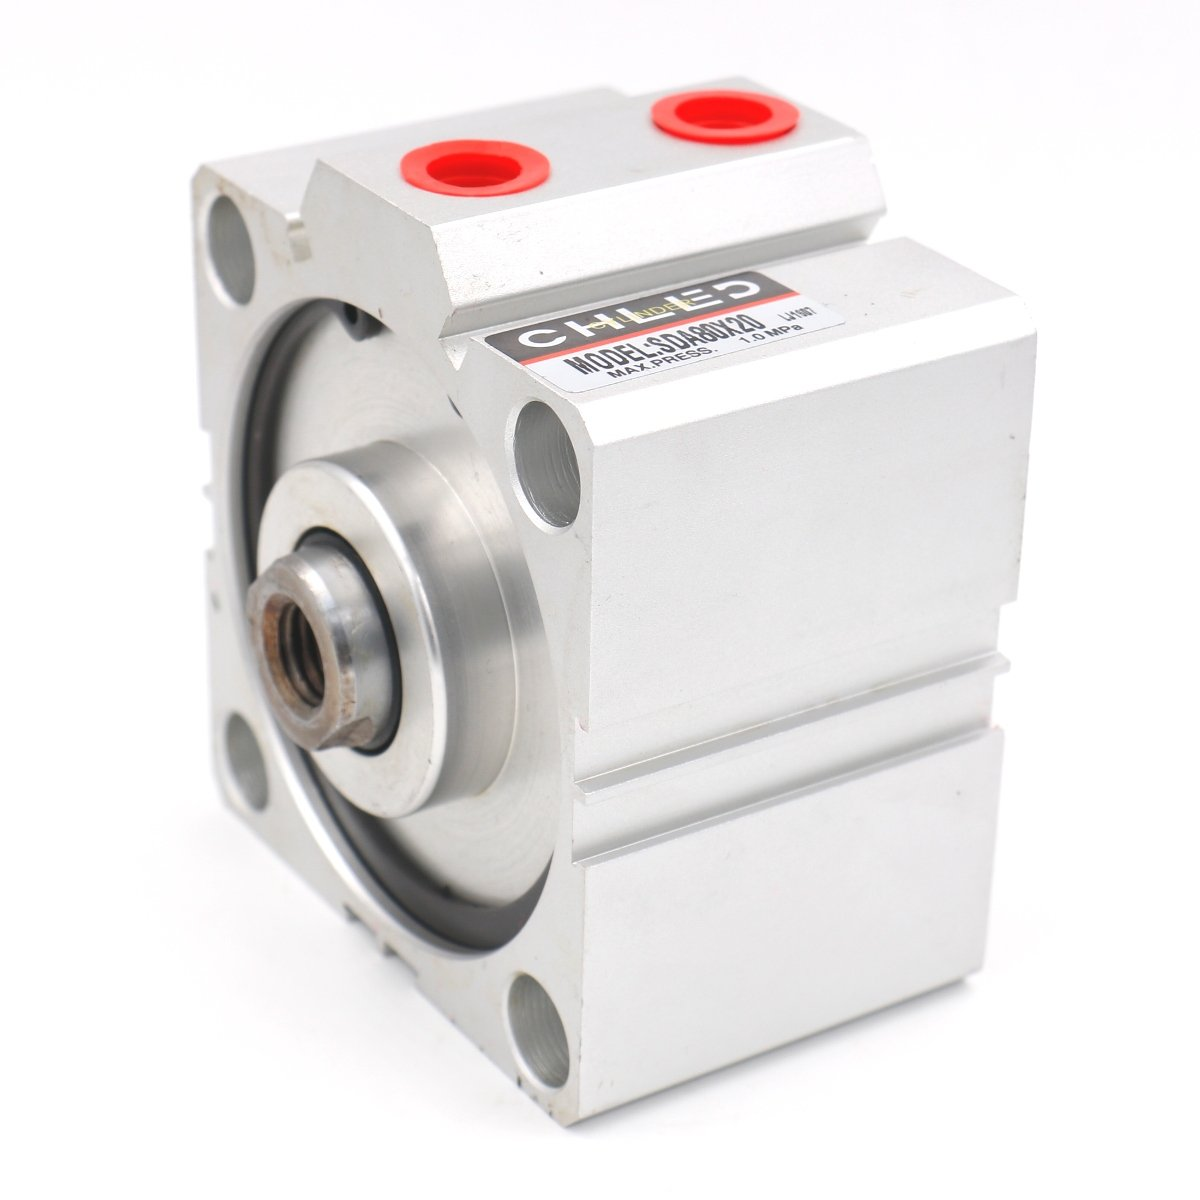 Baomain Compact Thin Air Cylinder SDA 80x20 80mm Bore 20mm Stroke PT3/8 Port